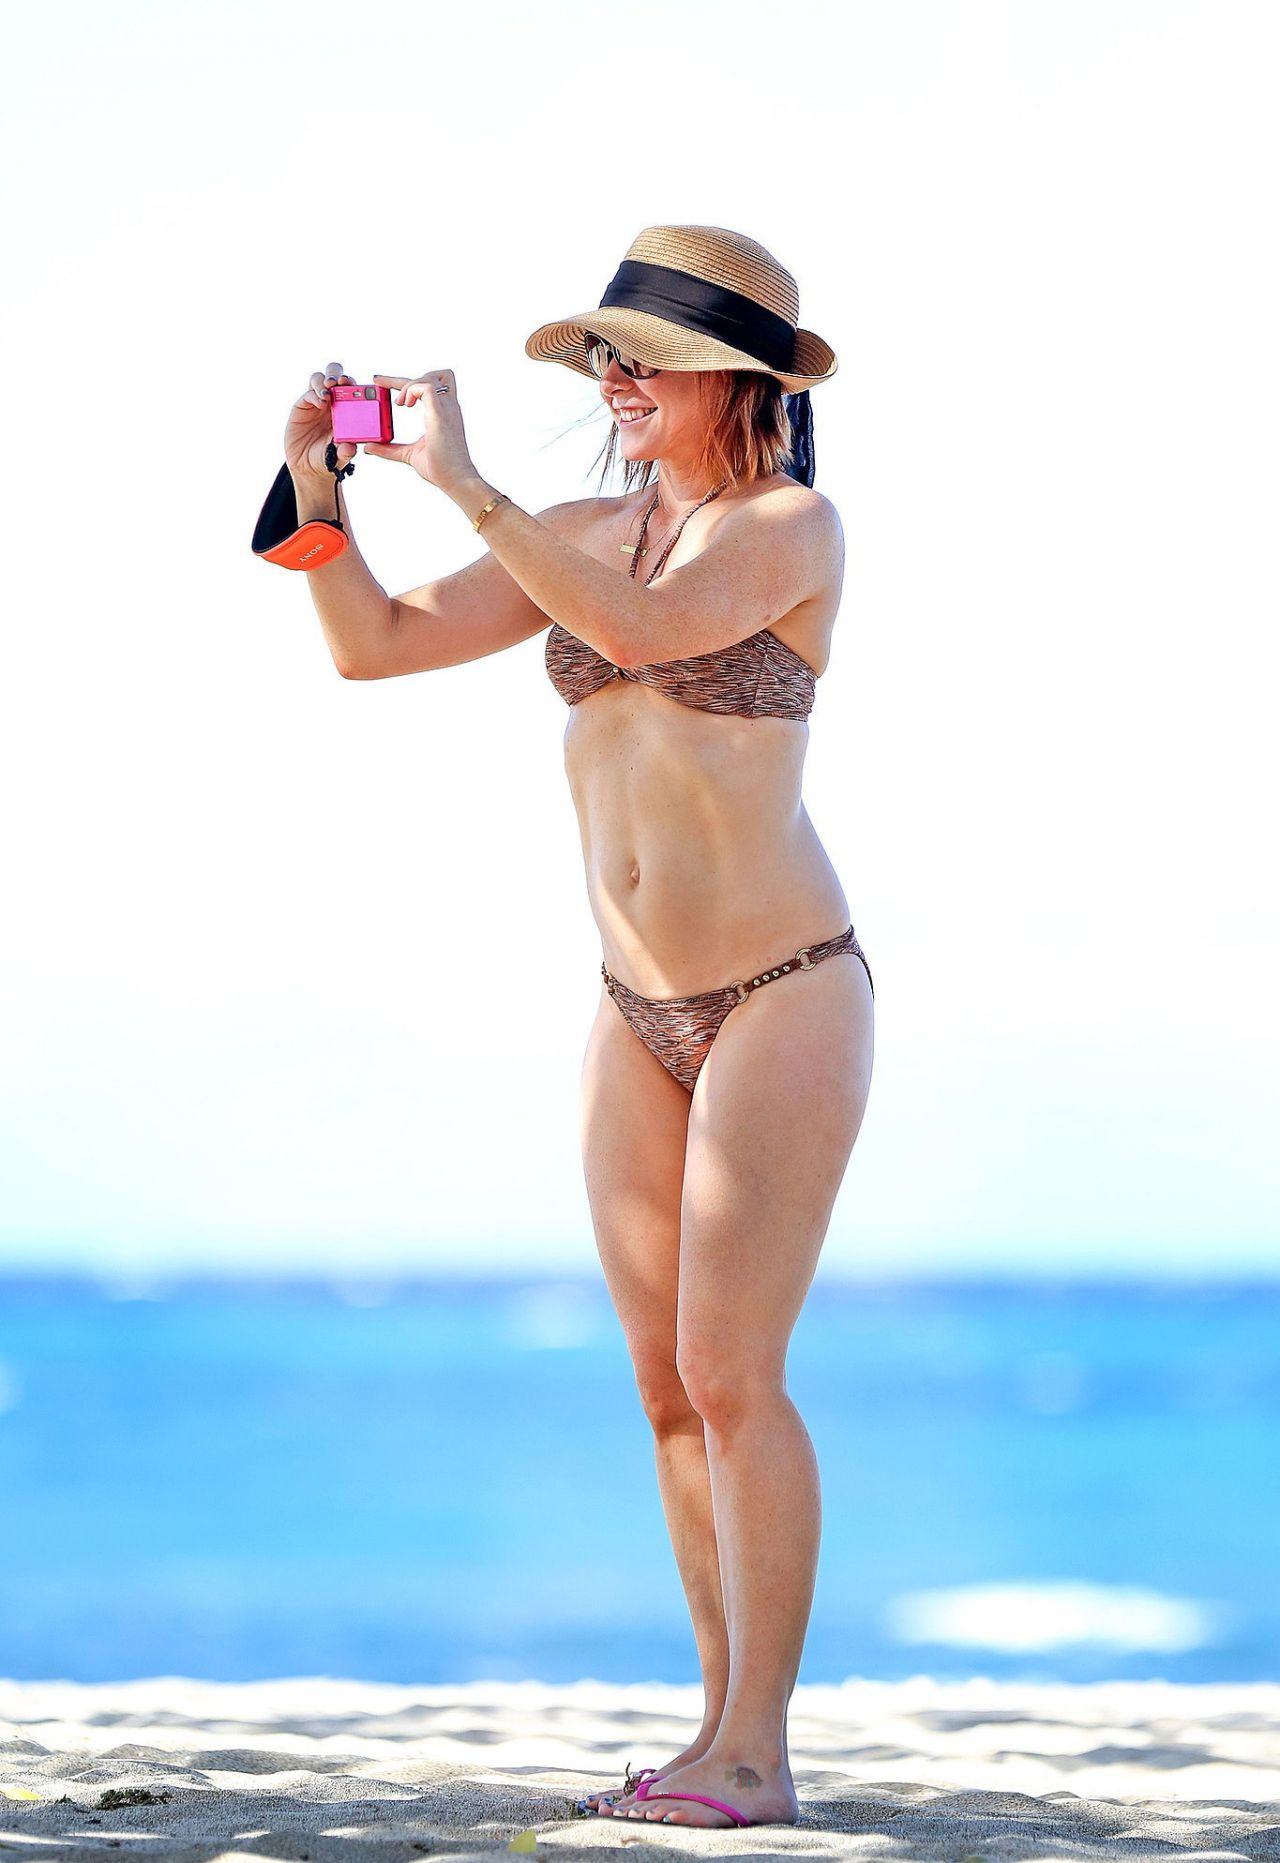 Bikini Alyson Hannigan nudes (11 foto and video), Pussy, Is a cute, Instagram, bra 2017